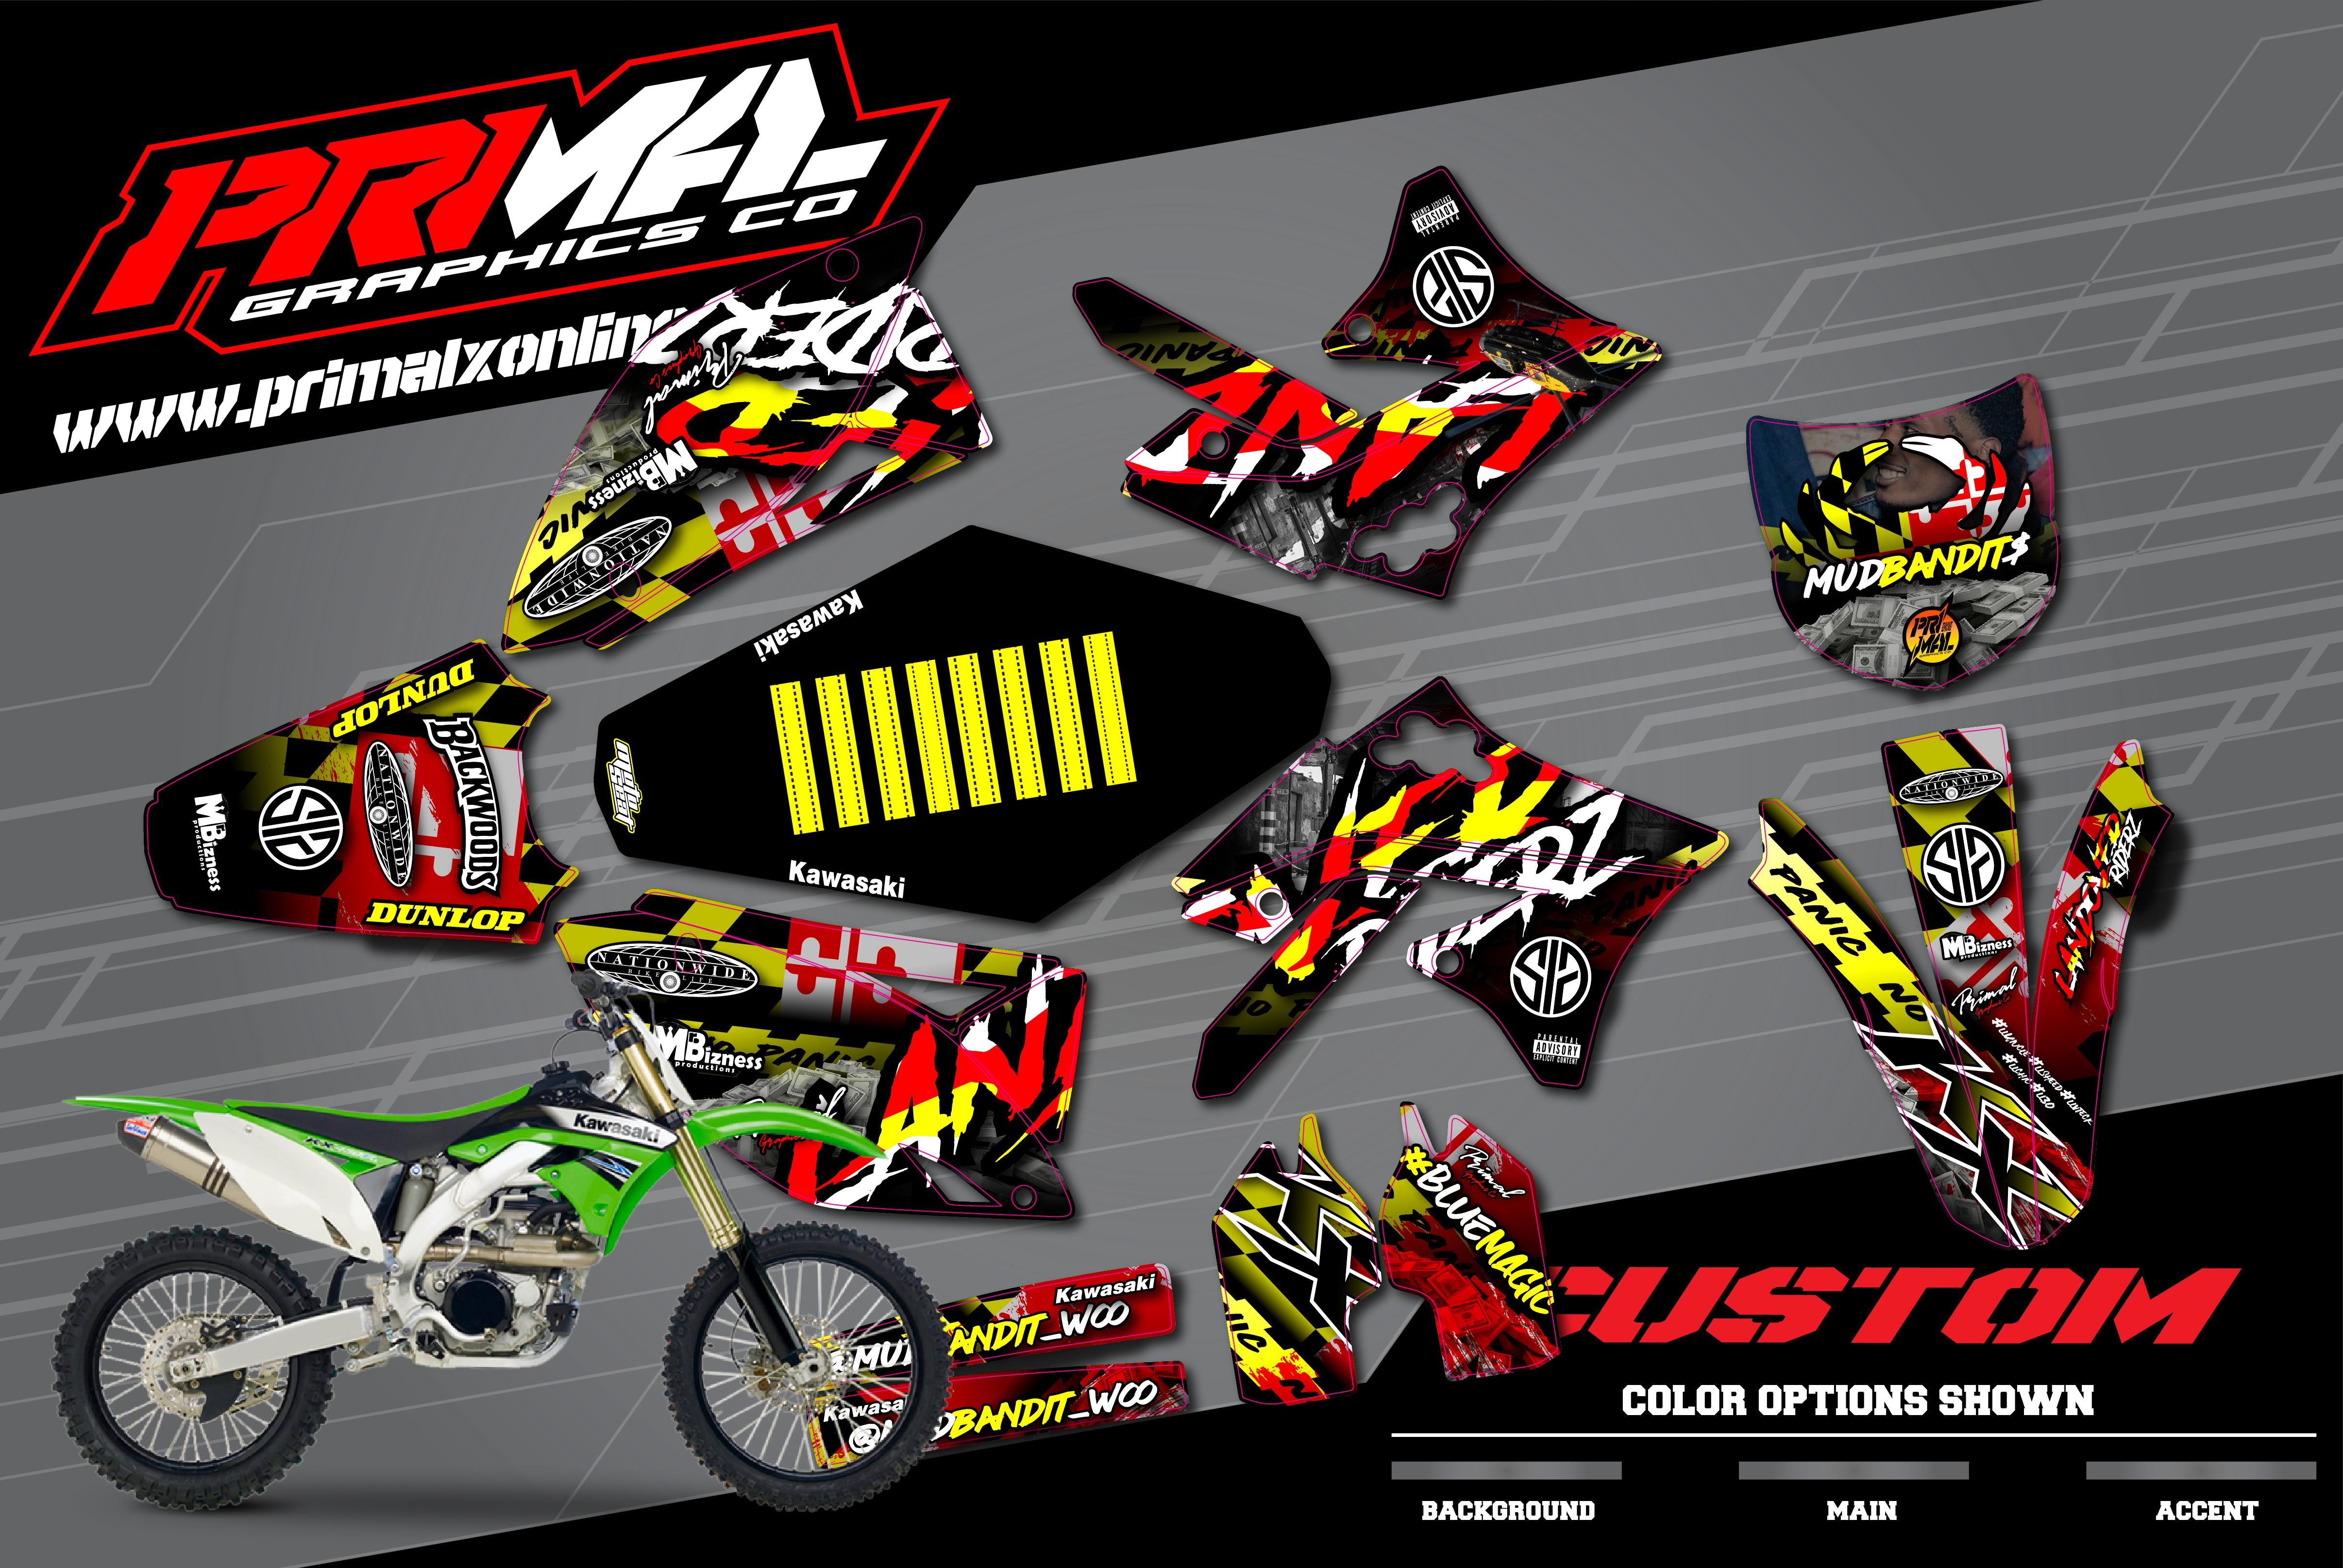 PRIMAL-X-MOTORSPORTS-PRIMAL-GRAPHICS-CO-SUZUKI-DRZ400SM-SUPERMOTO-MOTOCROSS-GRAPHICS-BIKELIFE-CHARMCITY-LANDOVER-RIDERS-MUDBANDIT-01